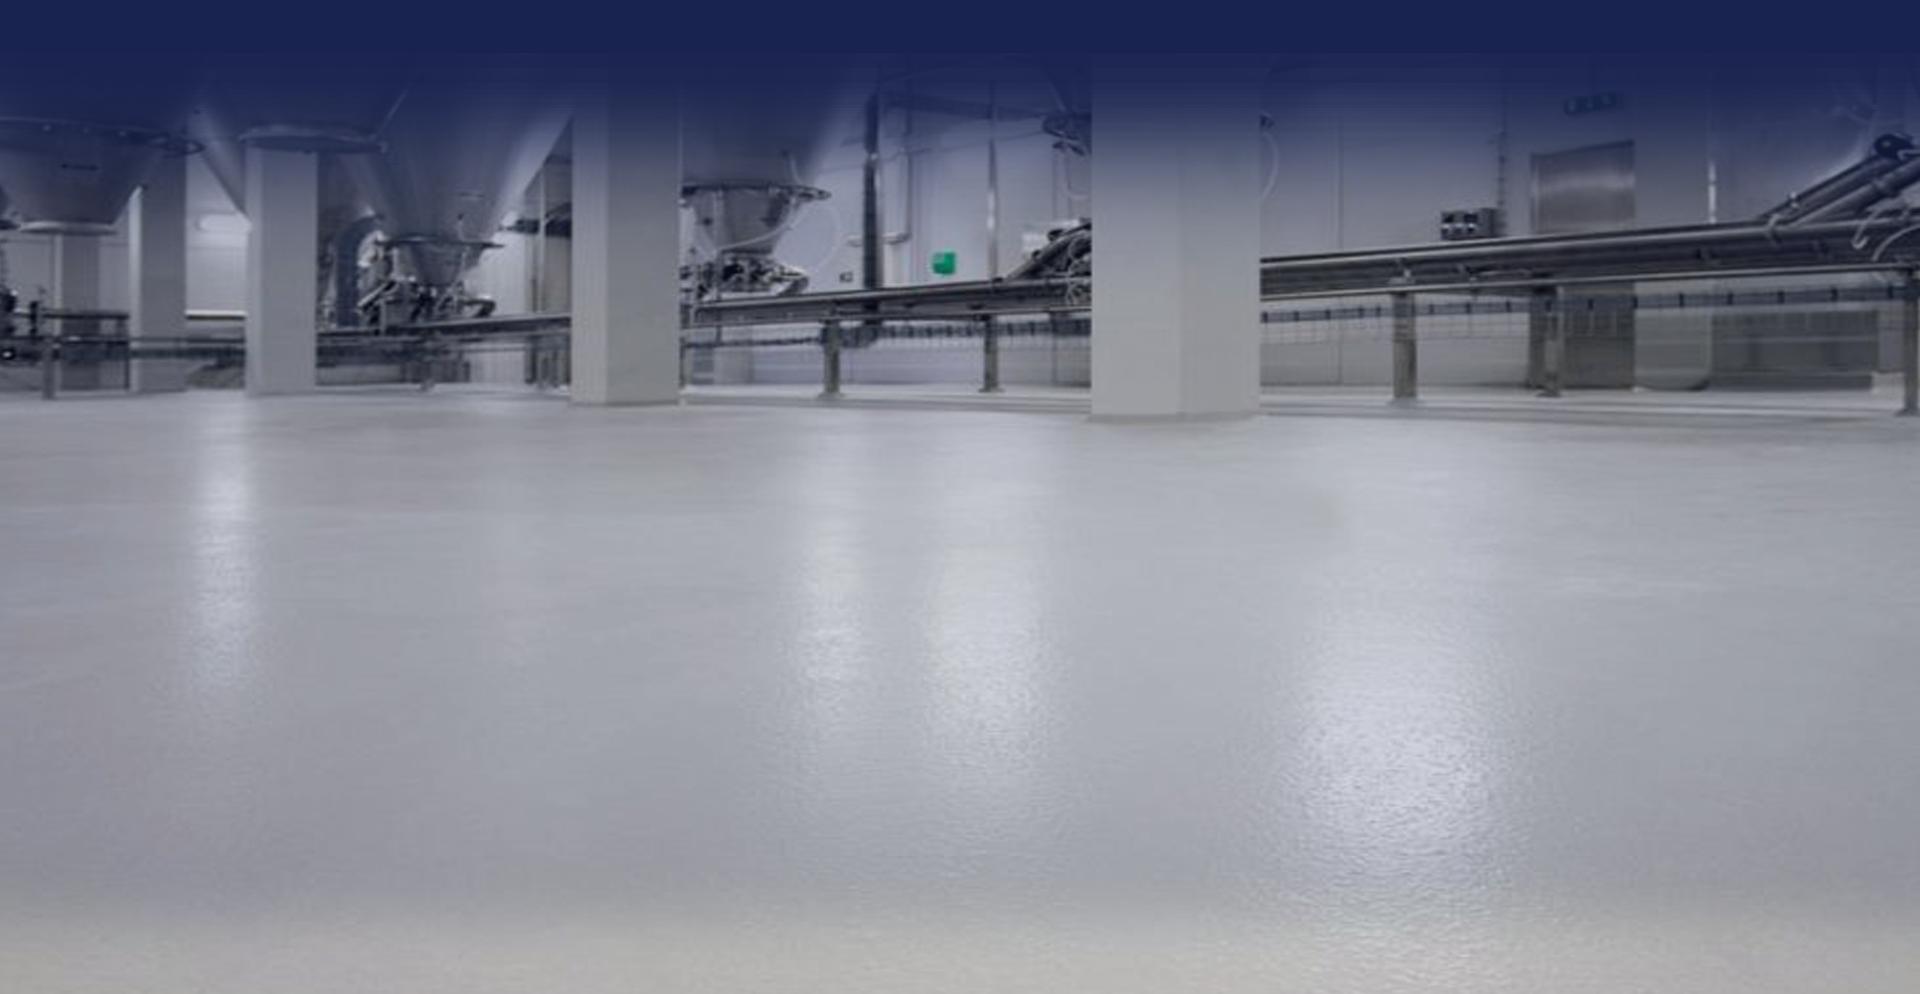 Epoxy Novolac coating system KERAGUARD VL100